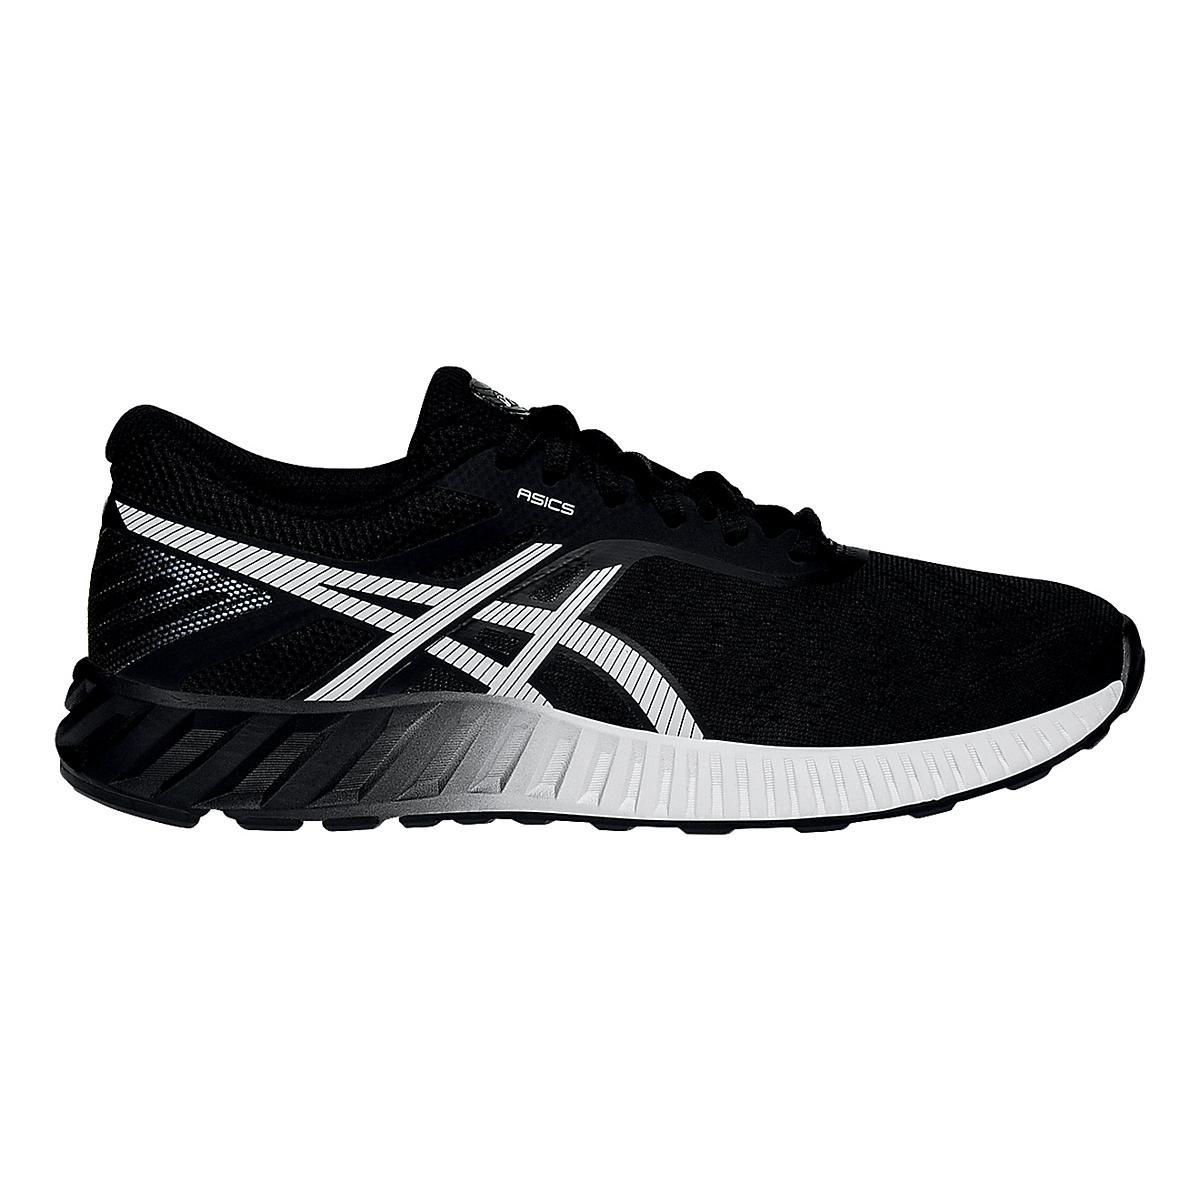 879f574a8764 Womens ASICS fuzeX Lyte Running Shoe at Road Runner Sports